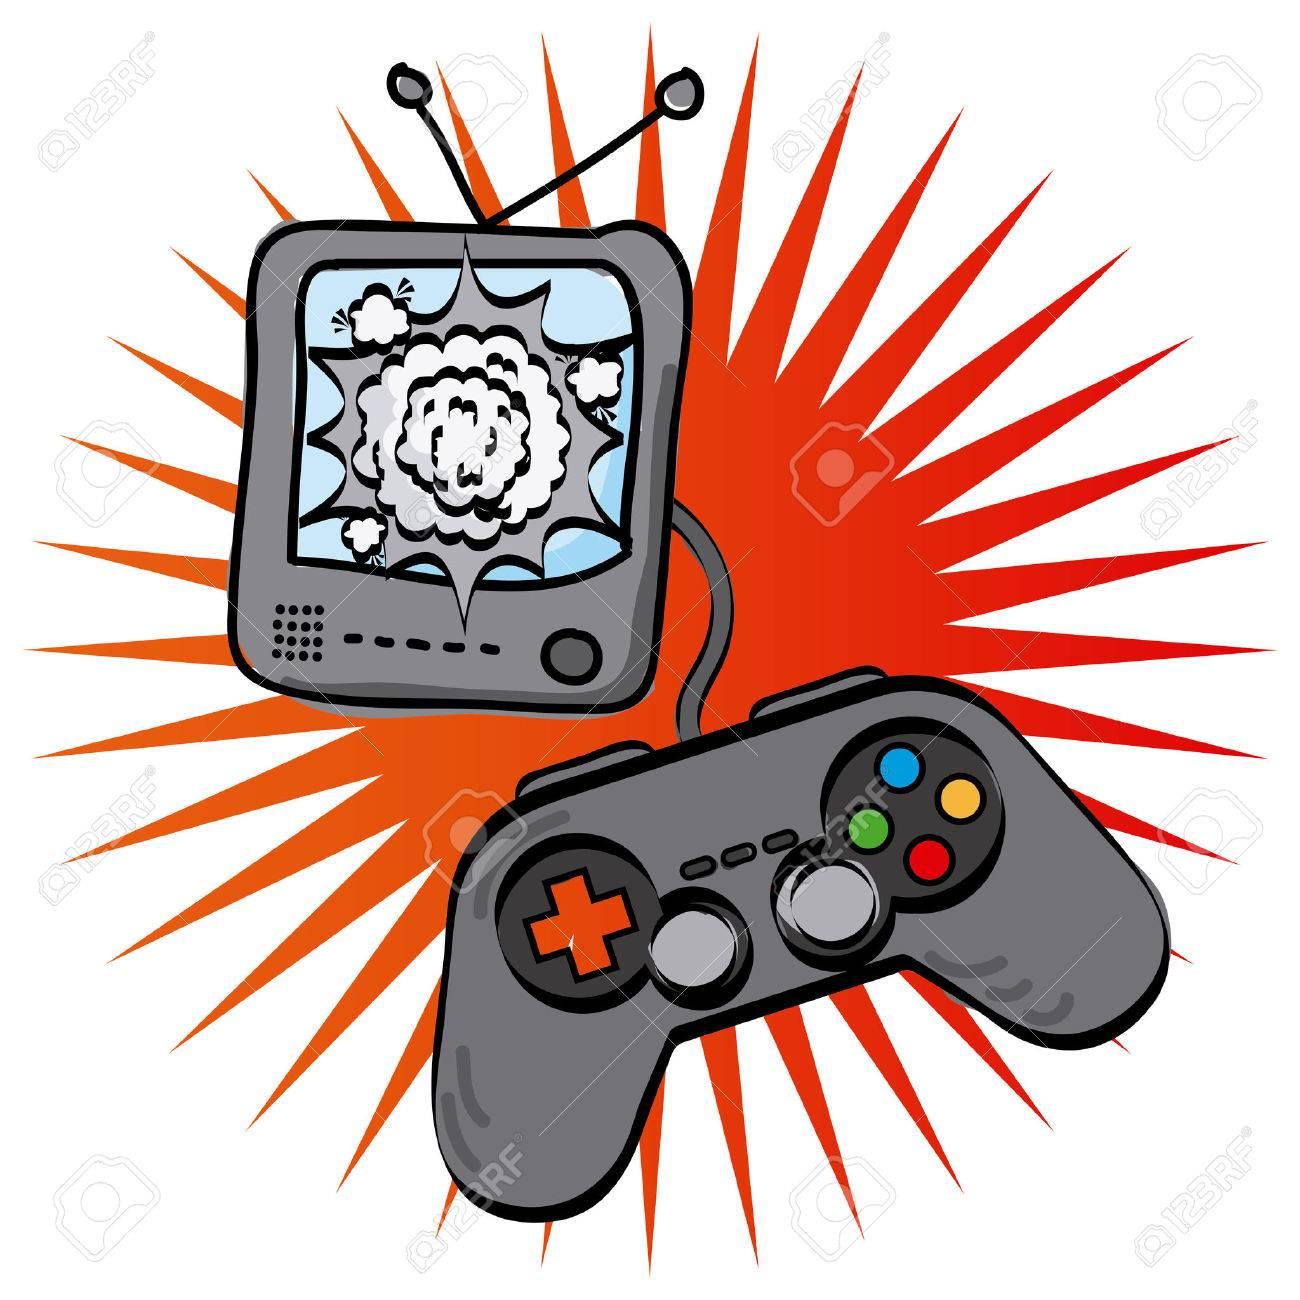 video games design, vector illustration.